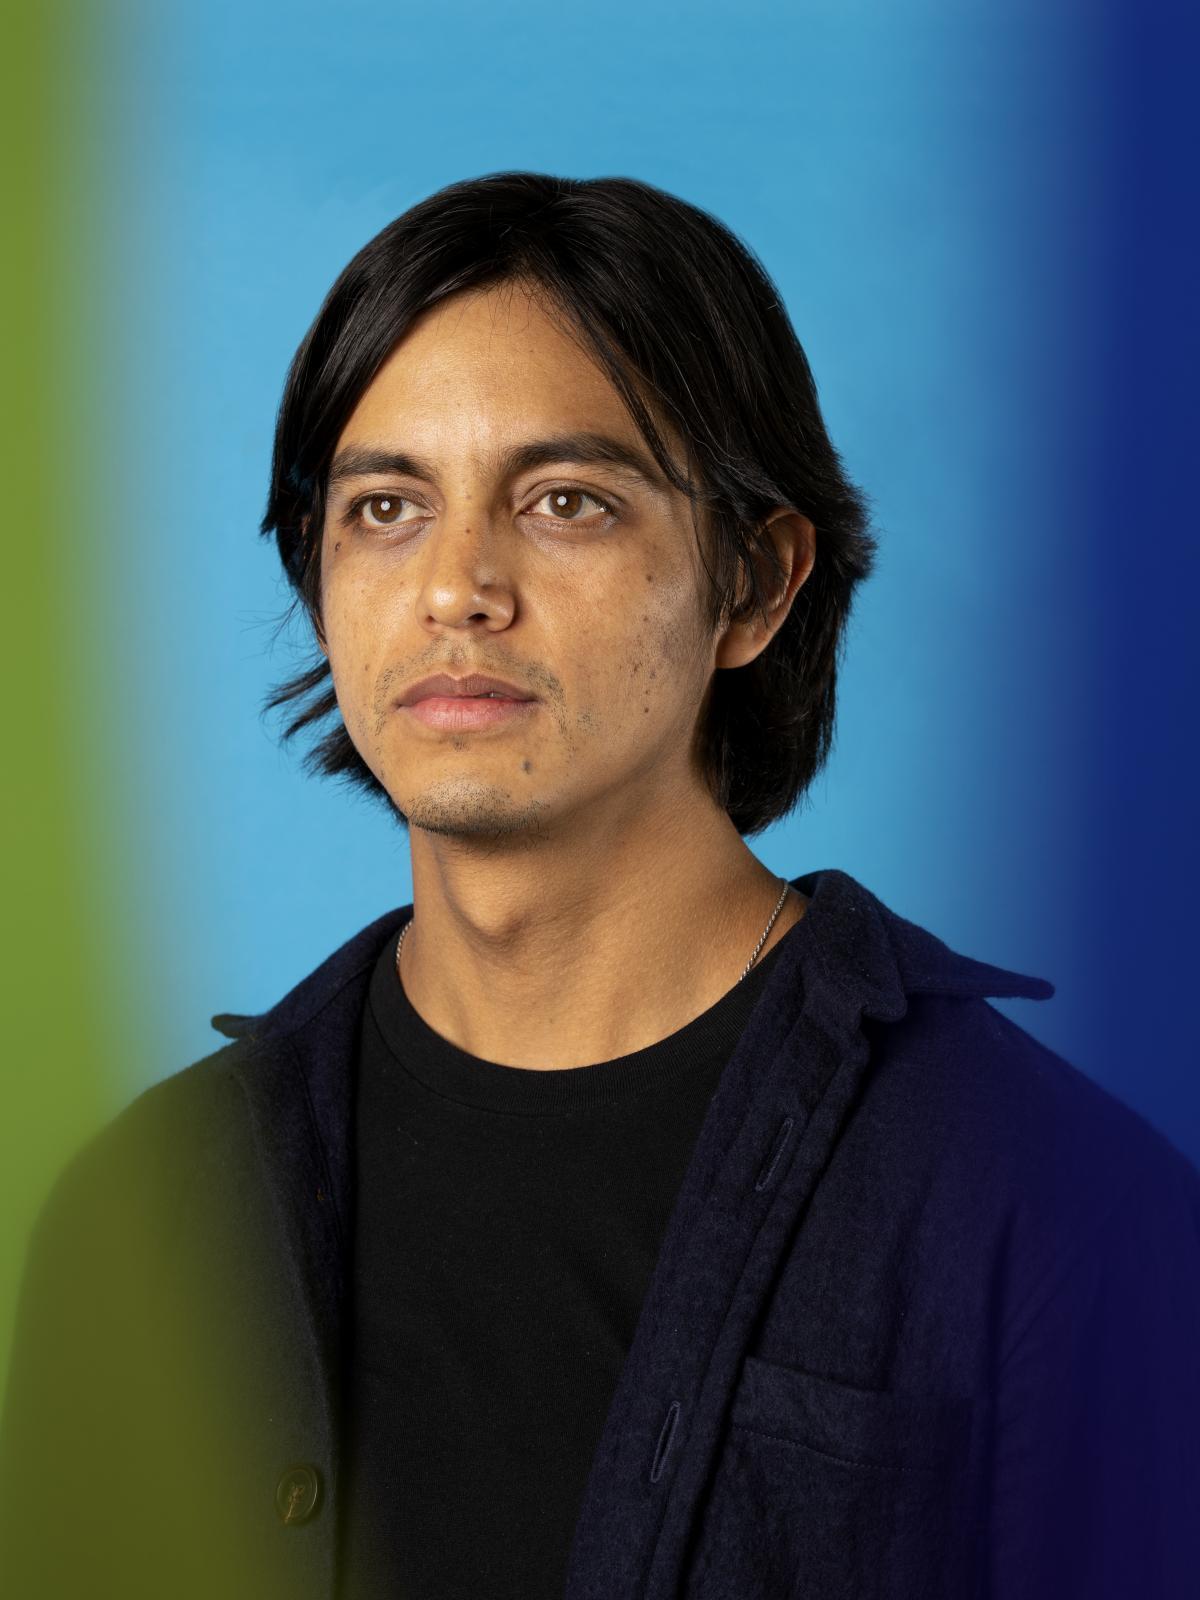 Adrian Florido, Reporter